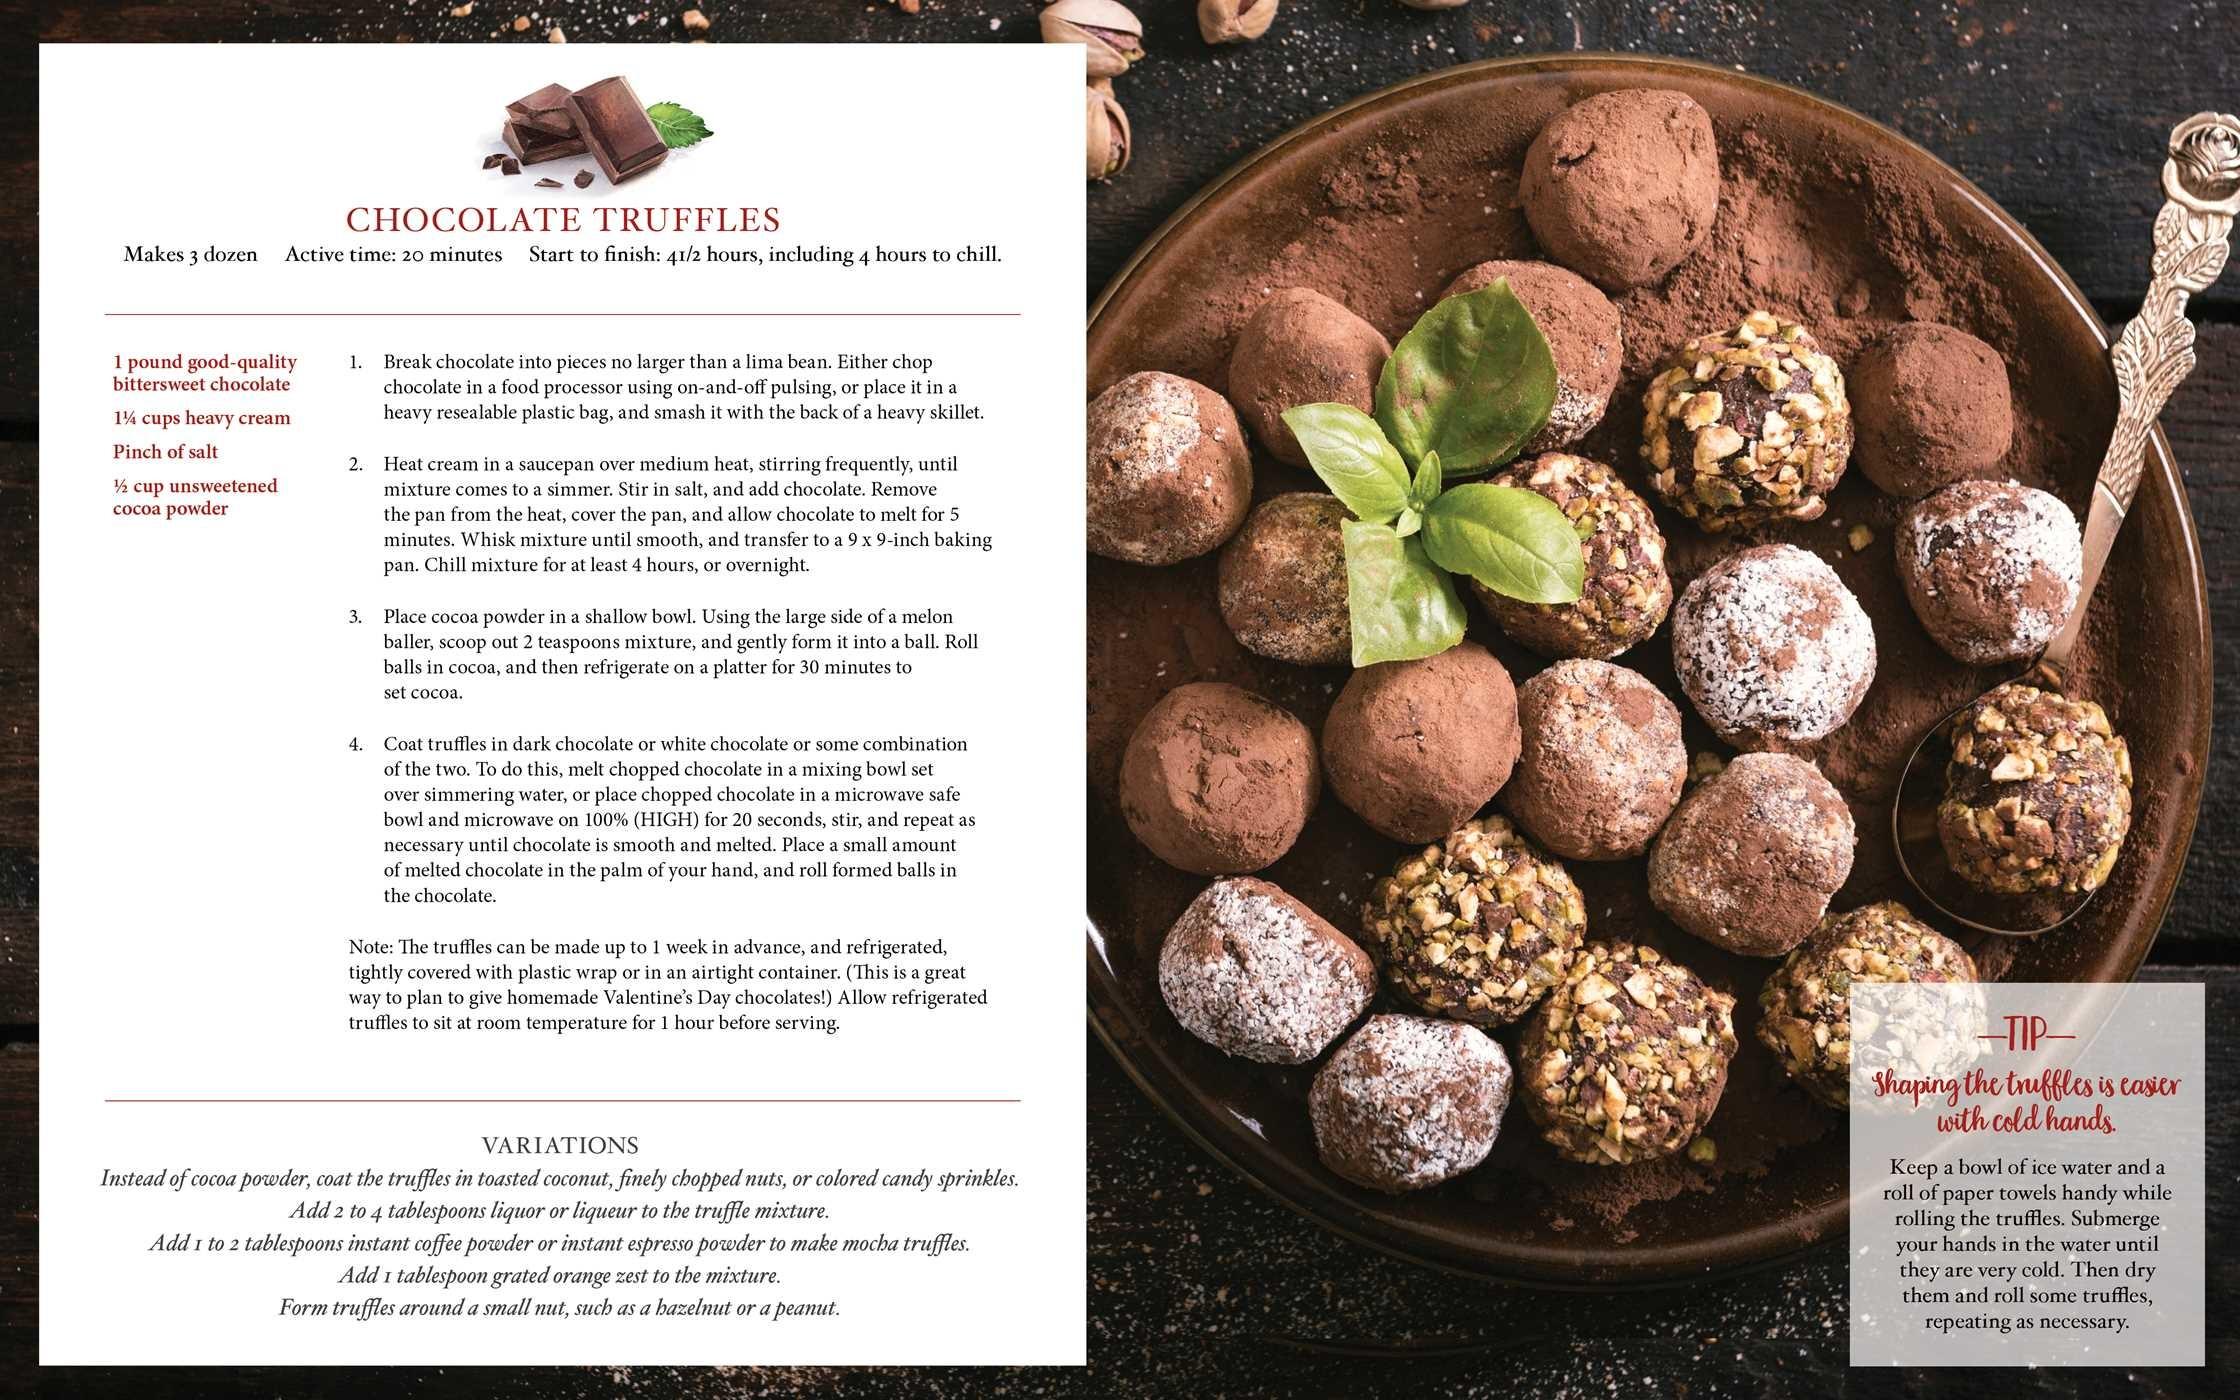 The sunday dinner cookbook 9781604337525.in11